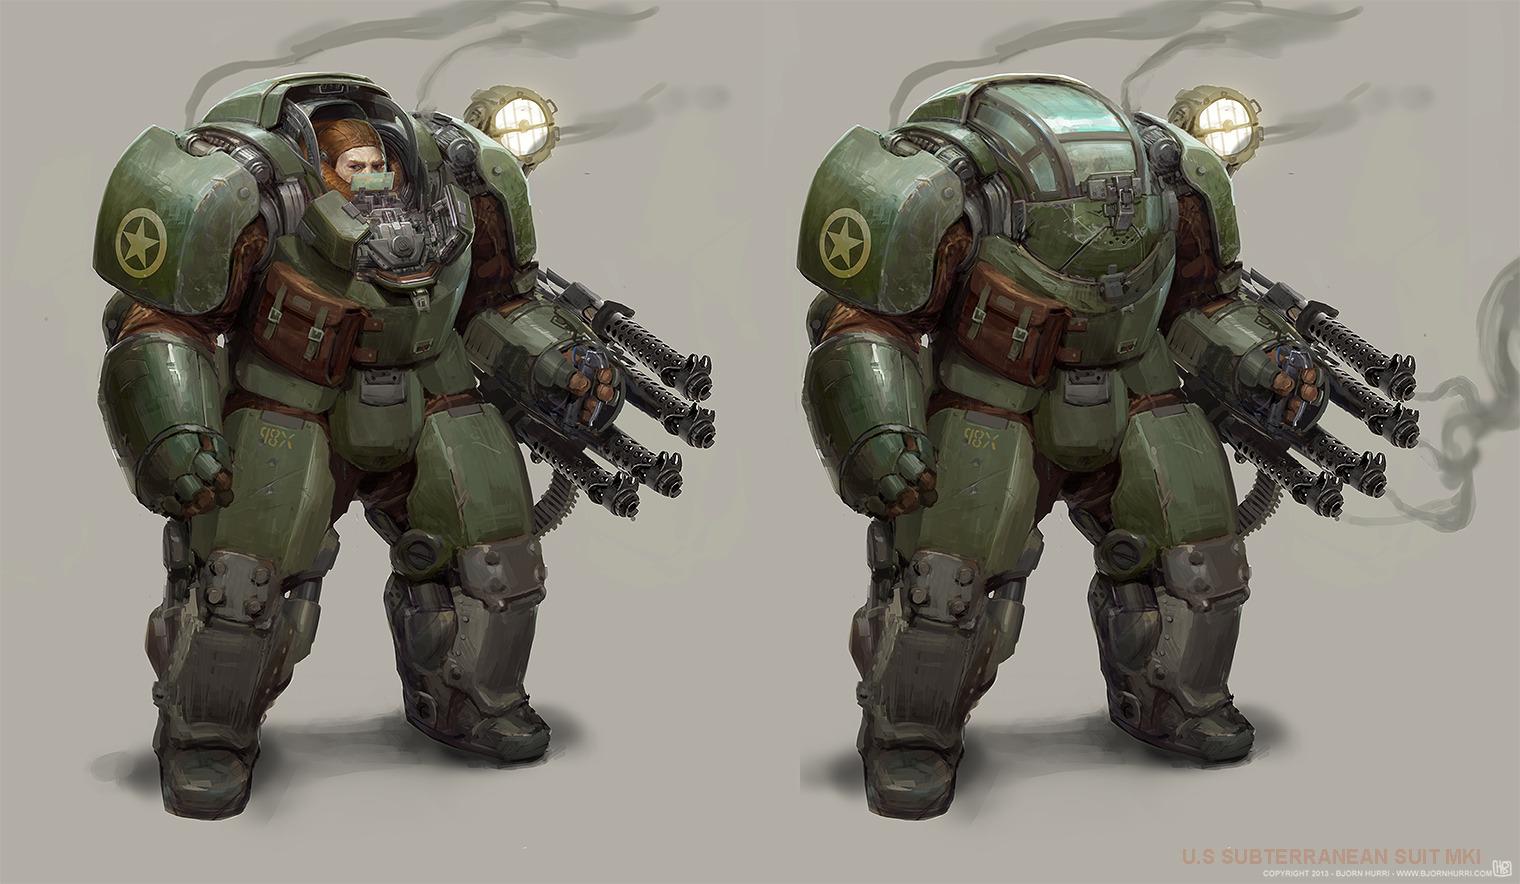 Sci Fi By Jd Clarke Armor